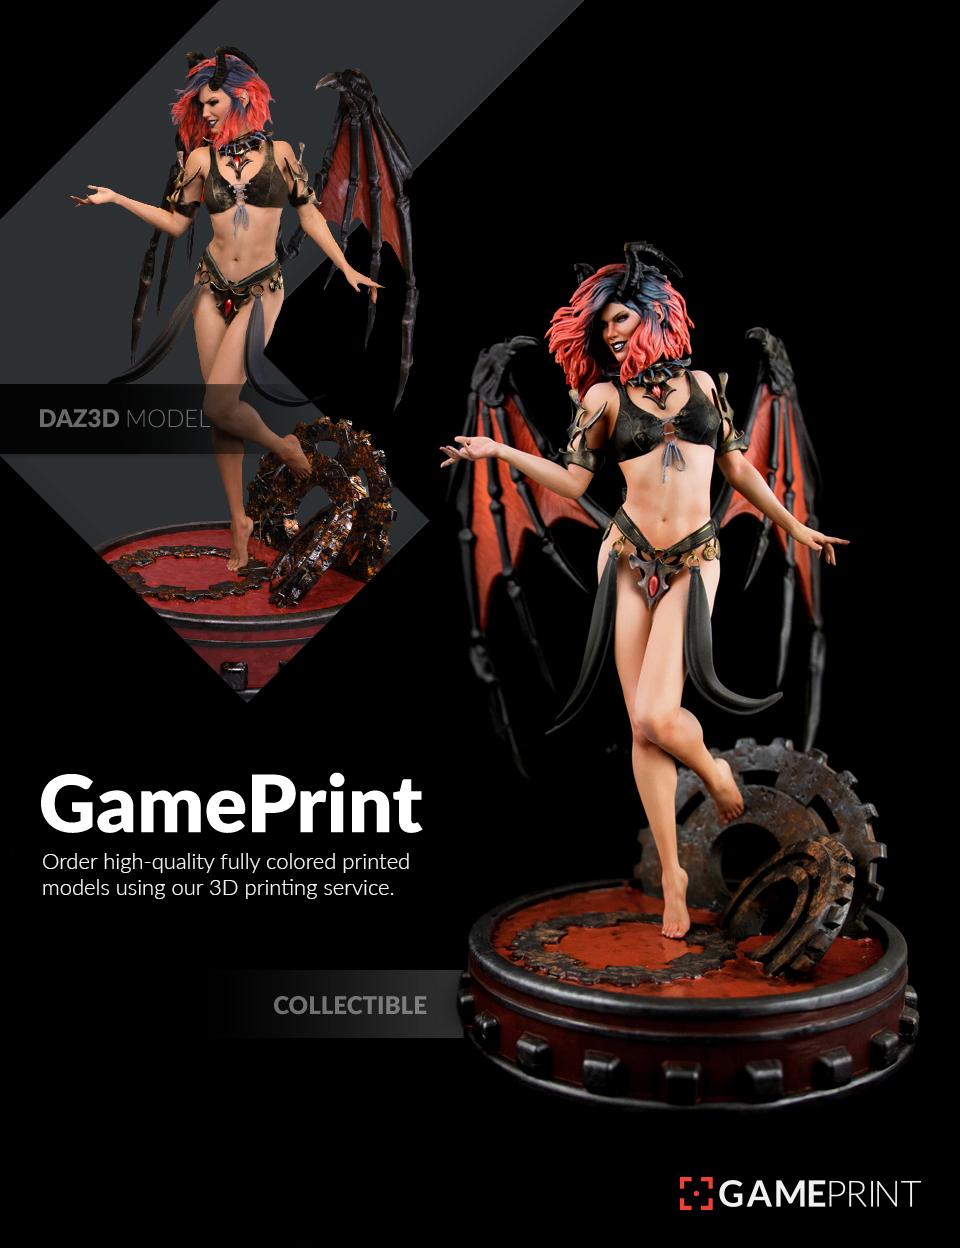 GamePrint: 3D Print Plugin by: Mixed Dimensions, 3D Models by Daz 3D